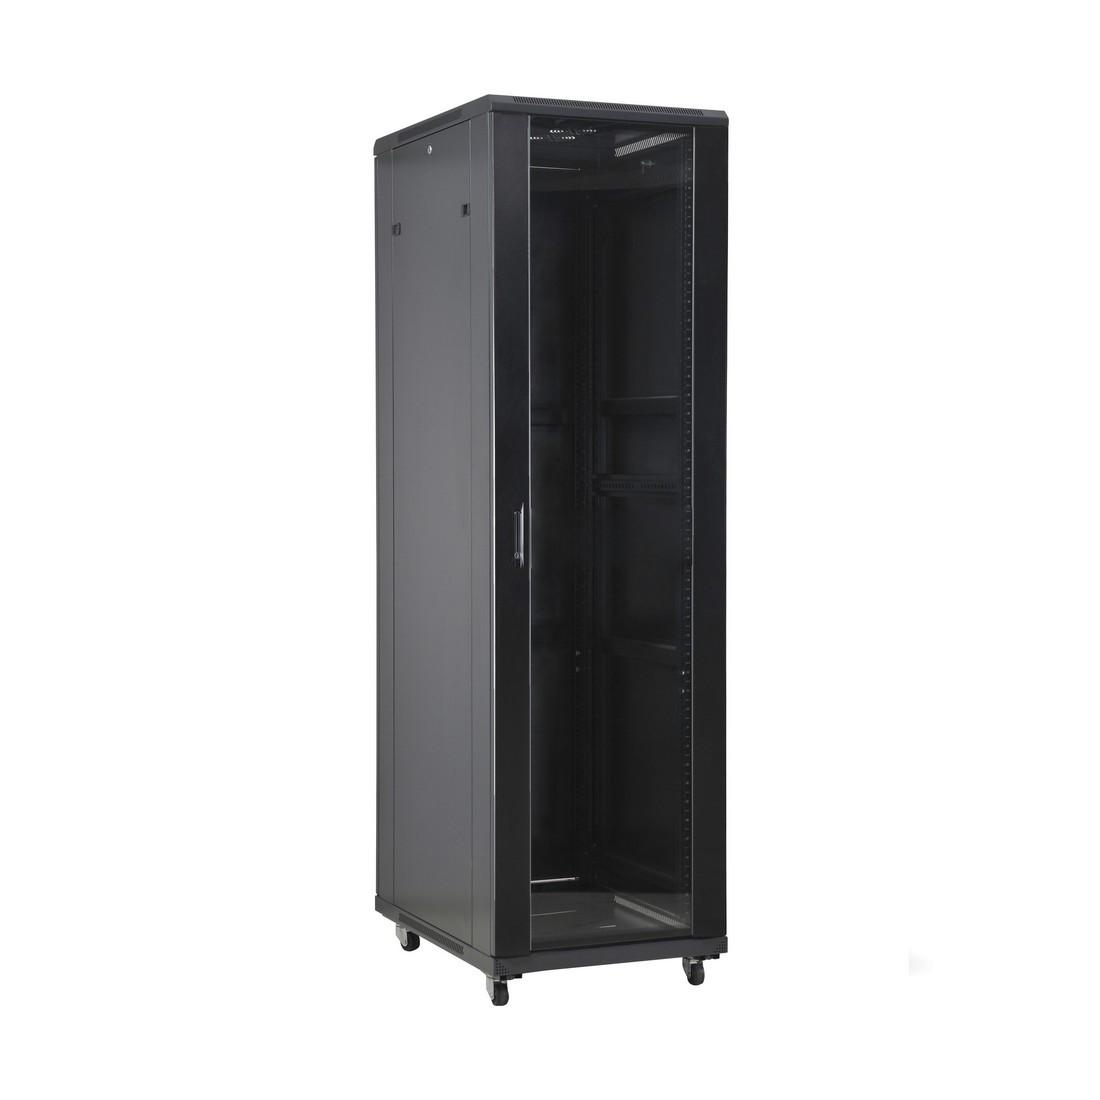 Шкаф серверный SHIP 601S.6824.03.100 24U 600*800*1200 мм